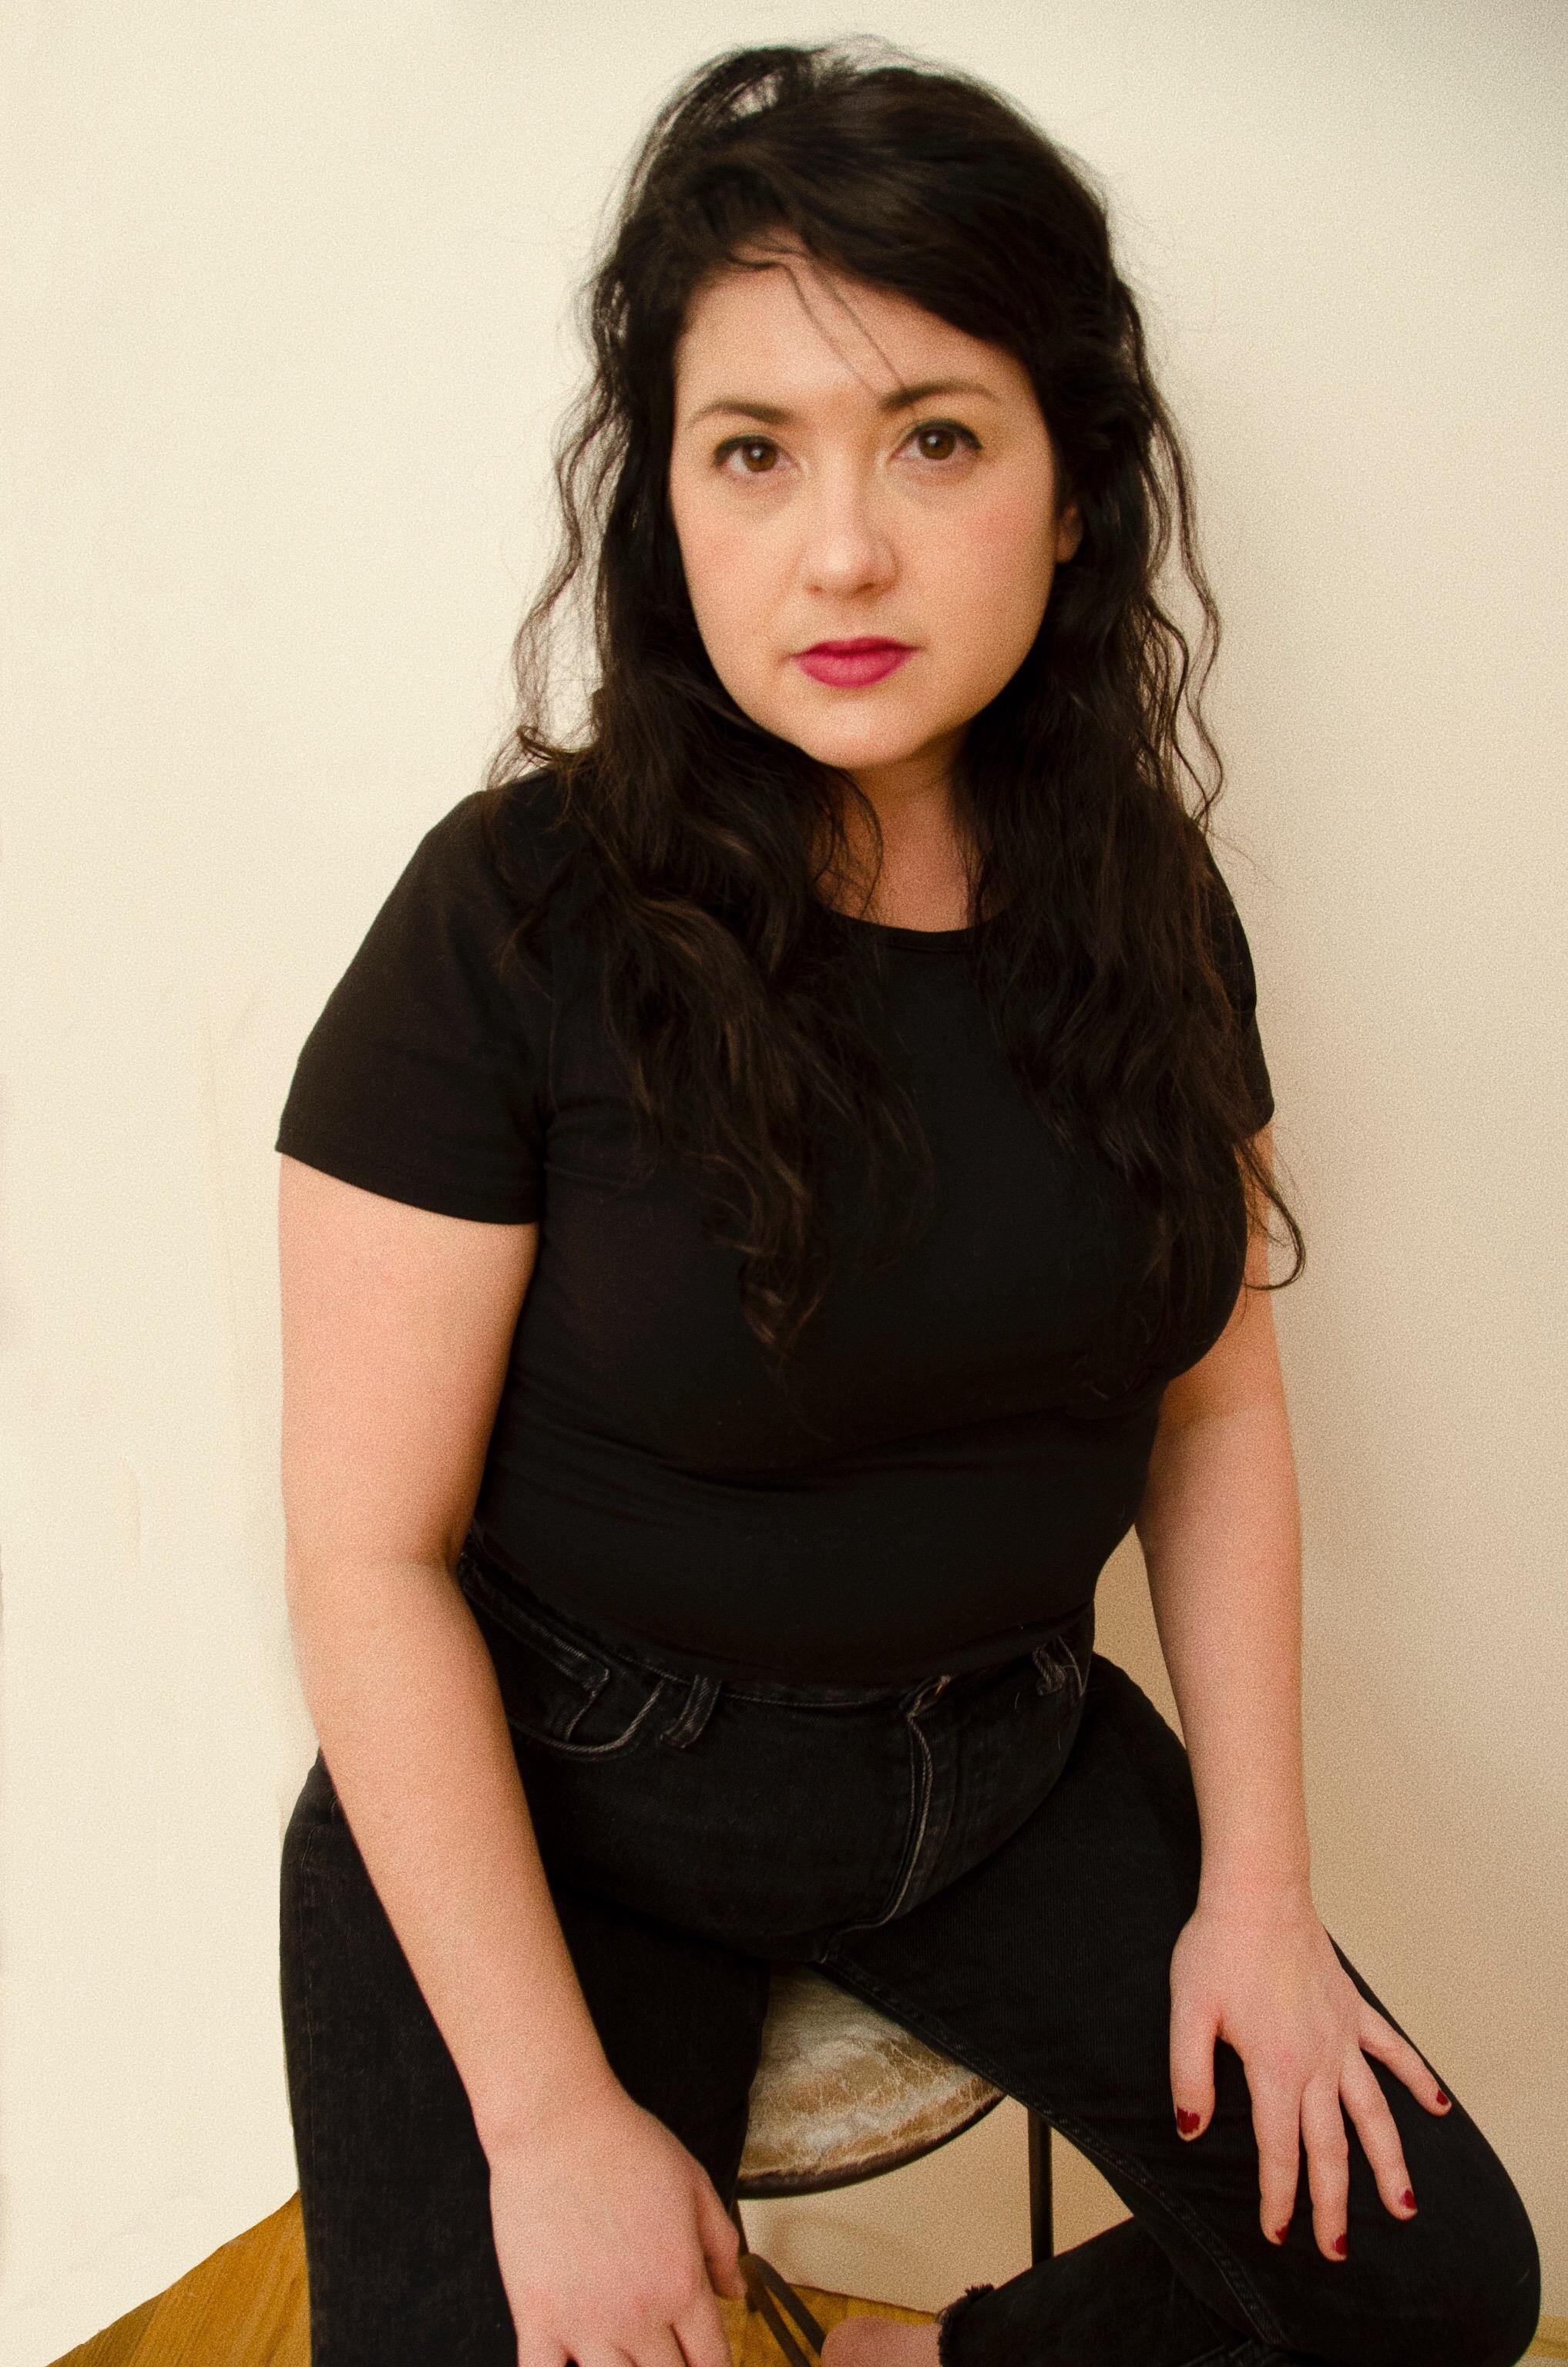 Jenny Kleiman